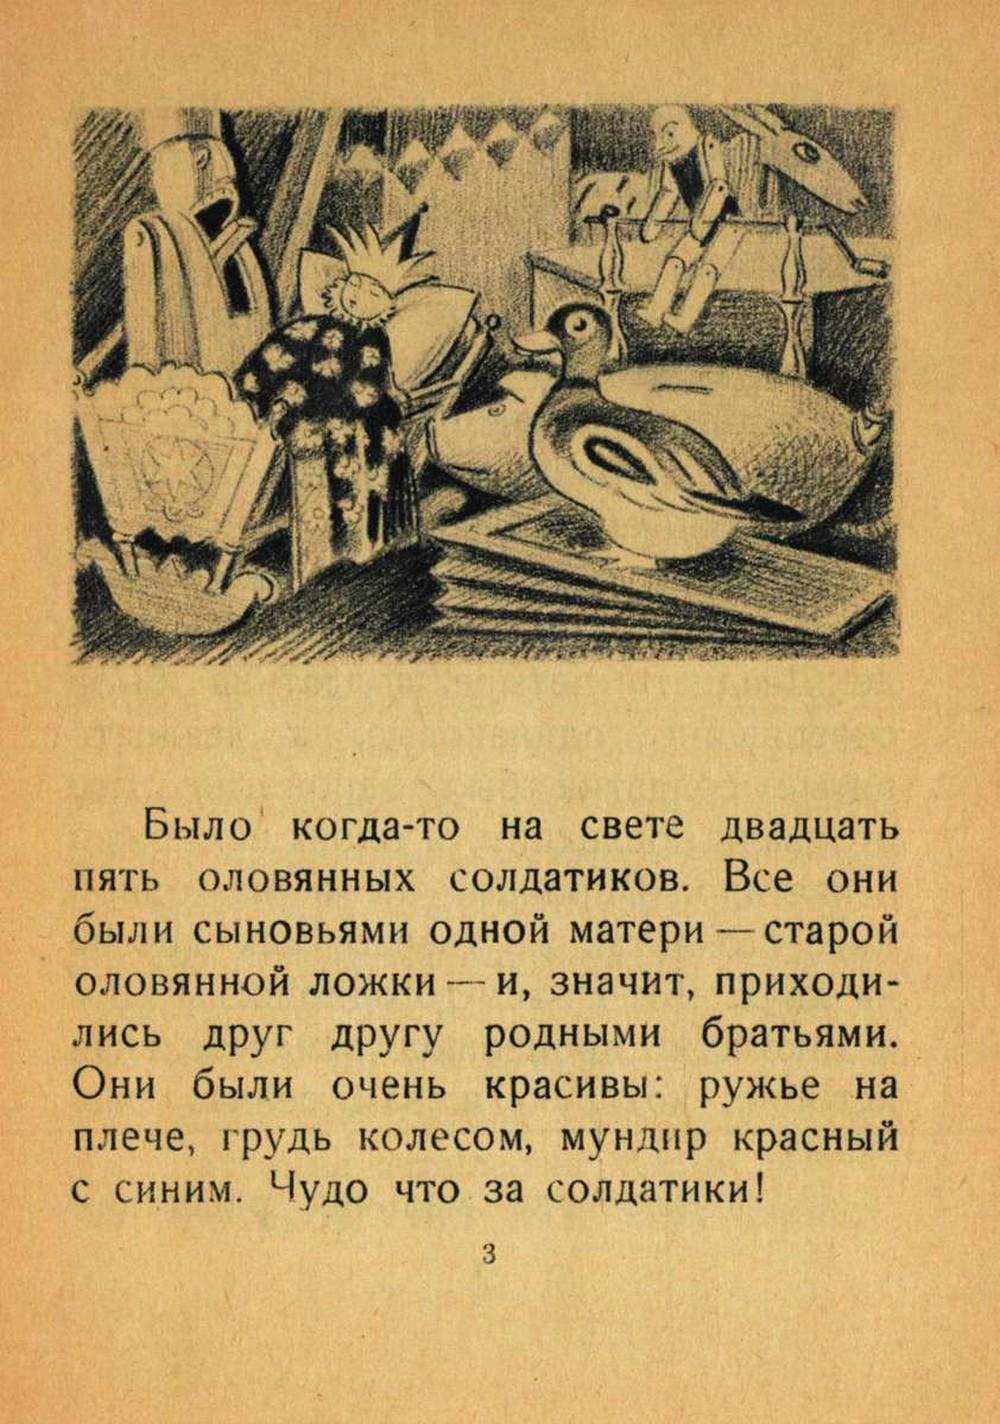 http://i5.imageban.ru/out/2013/09/22/881693b53a21a9822f52a18264ff9a9c.jpg